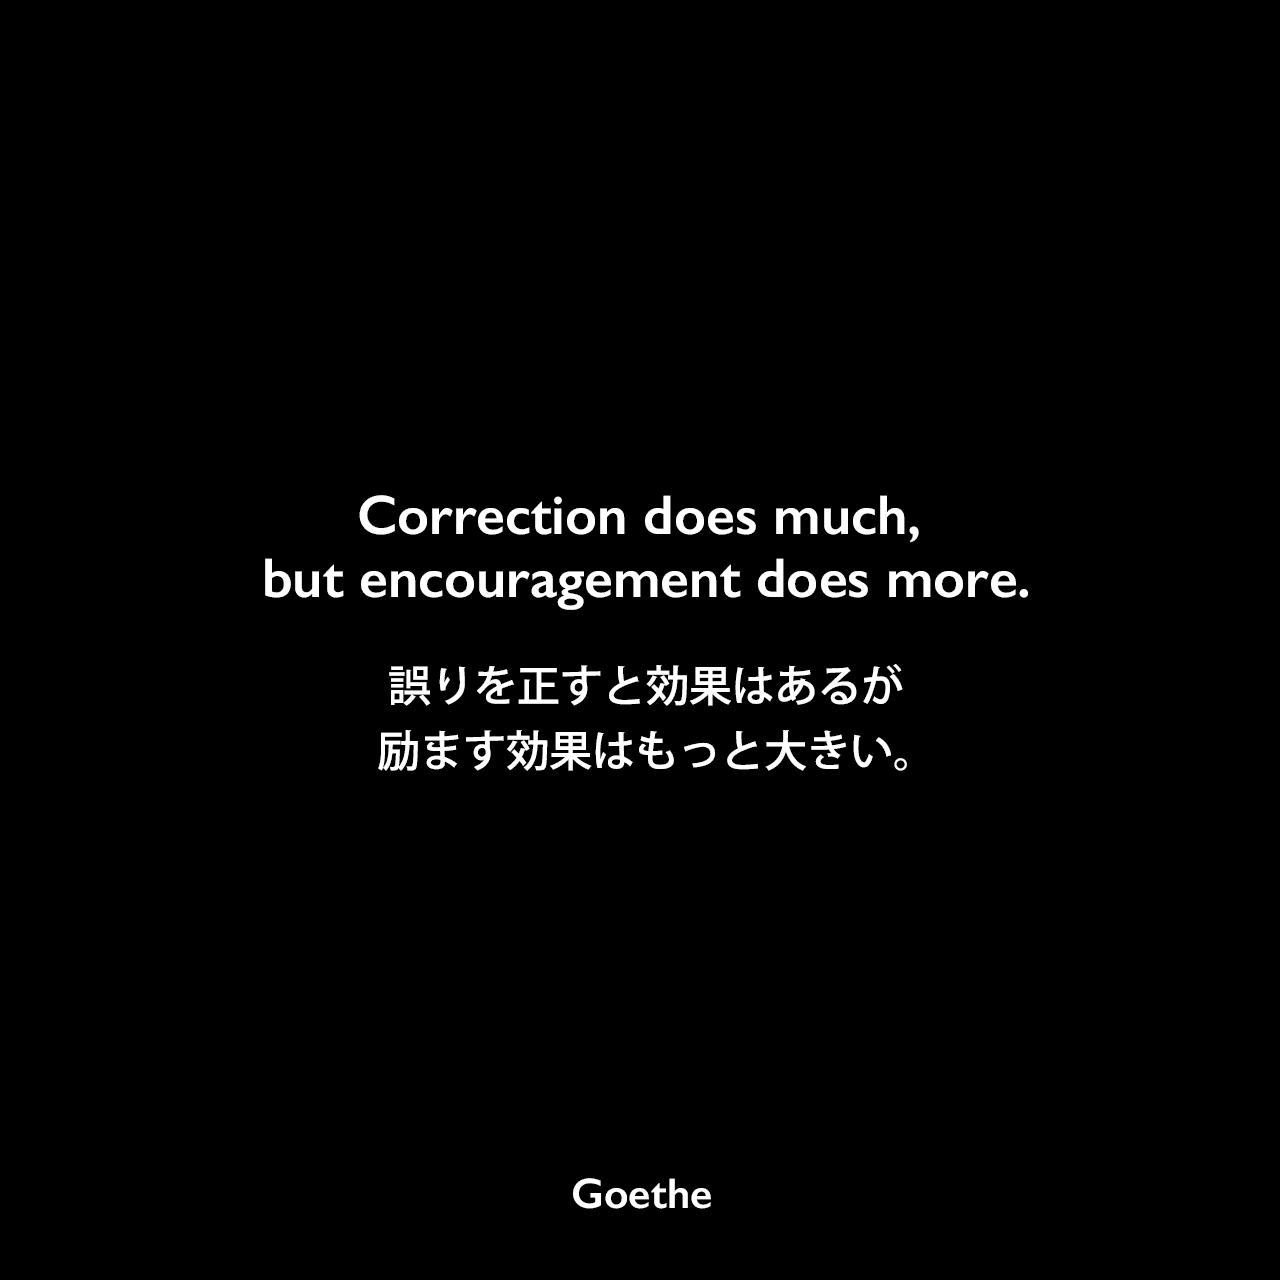 Correction does much, but encouragement does more.誤りを正すと効果はあるが、励ます効果はもっと大きい。Johann Wolfgang von Goethe